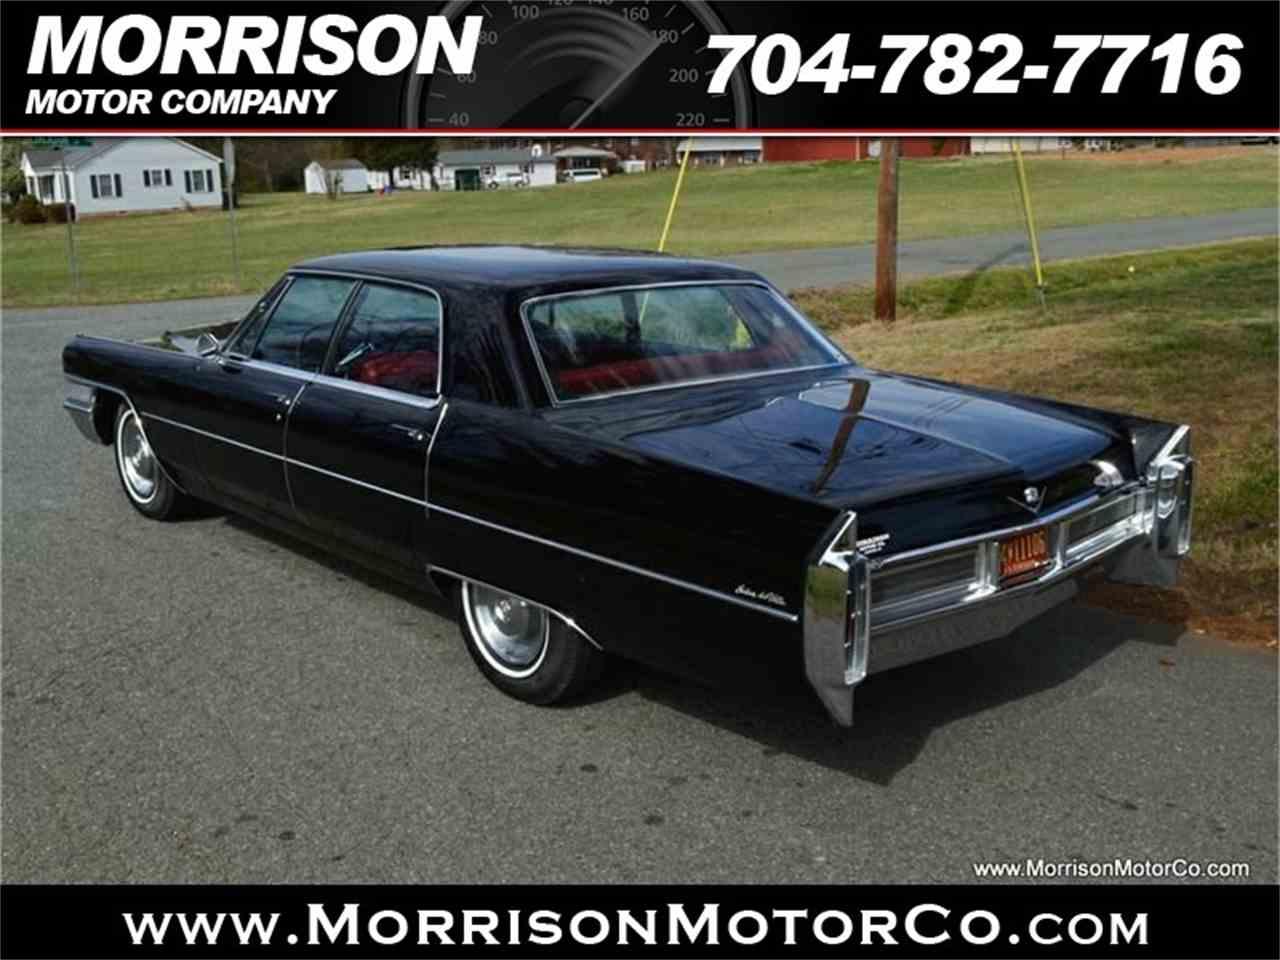 1965 Cadillac Deville For Sale: 1965 Cadillac Sedan DeVille For Sale